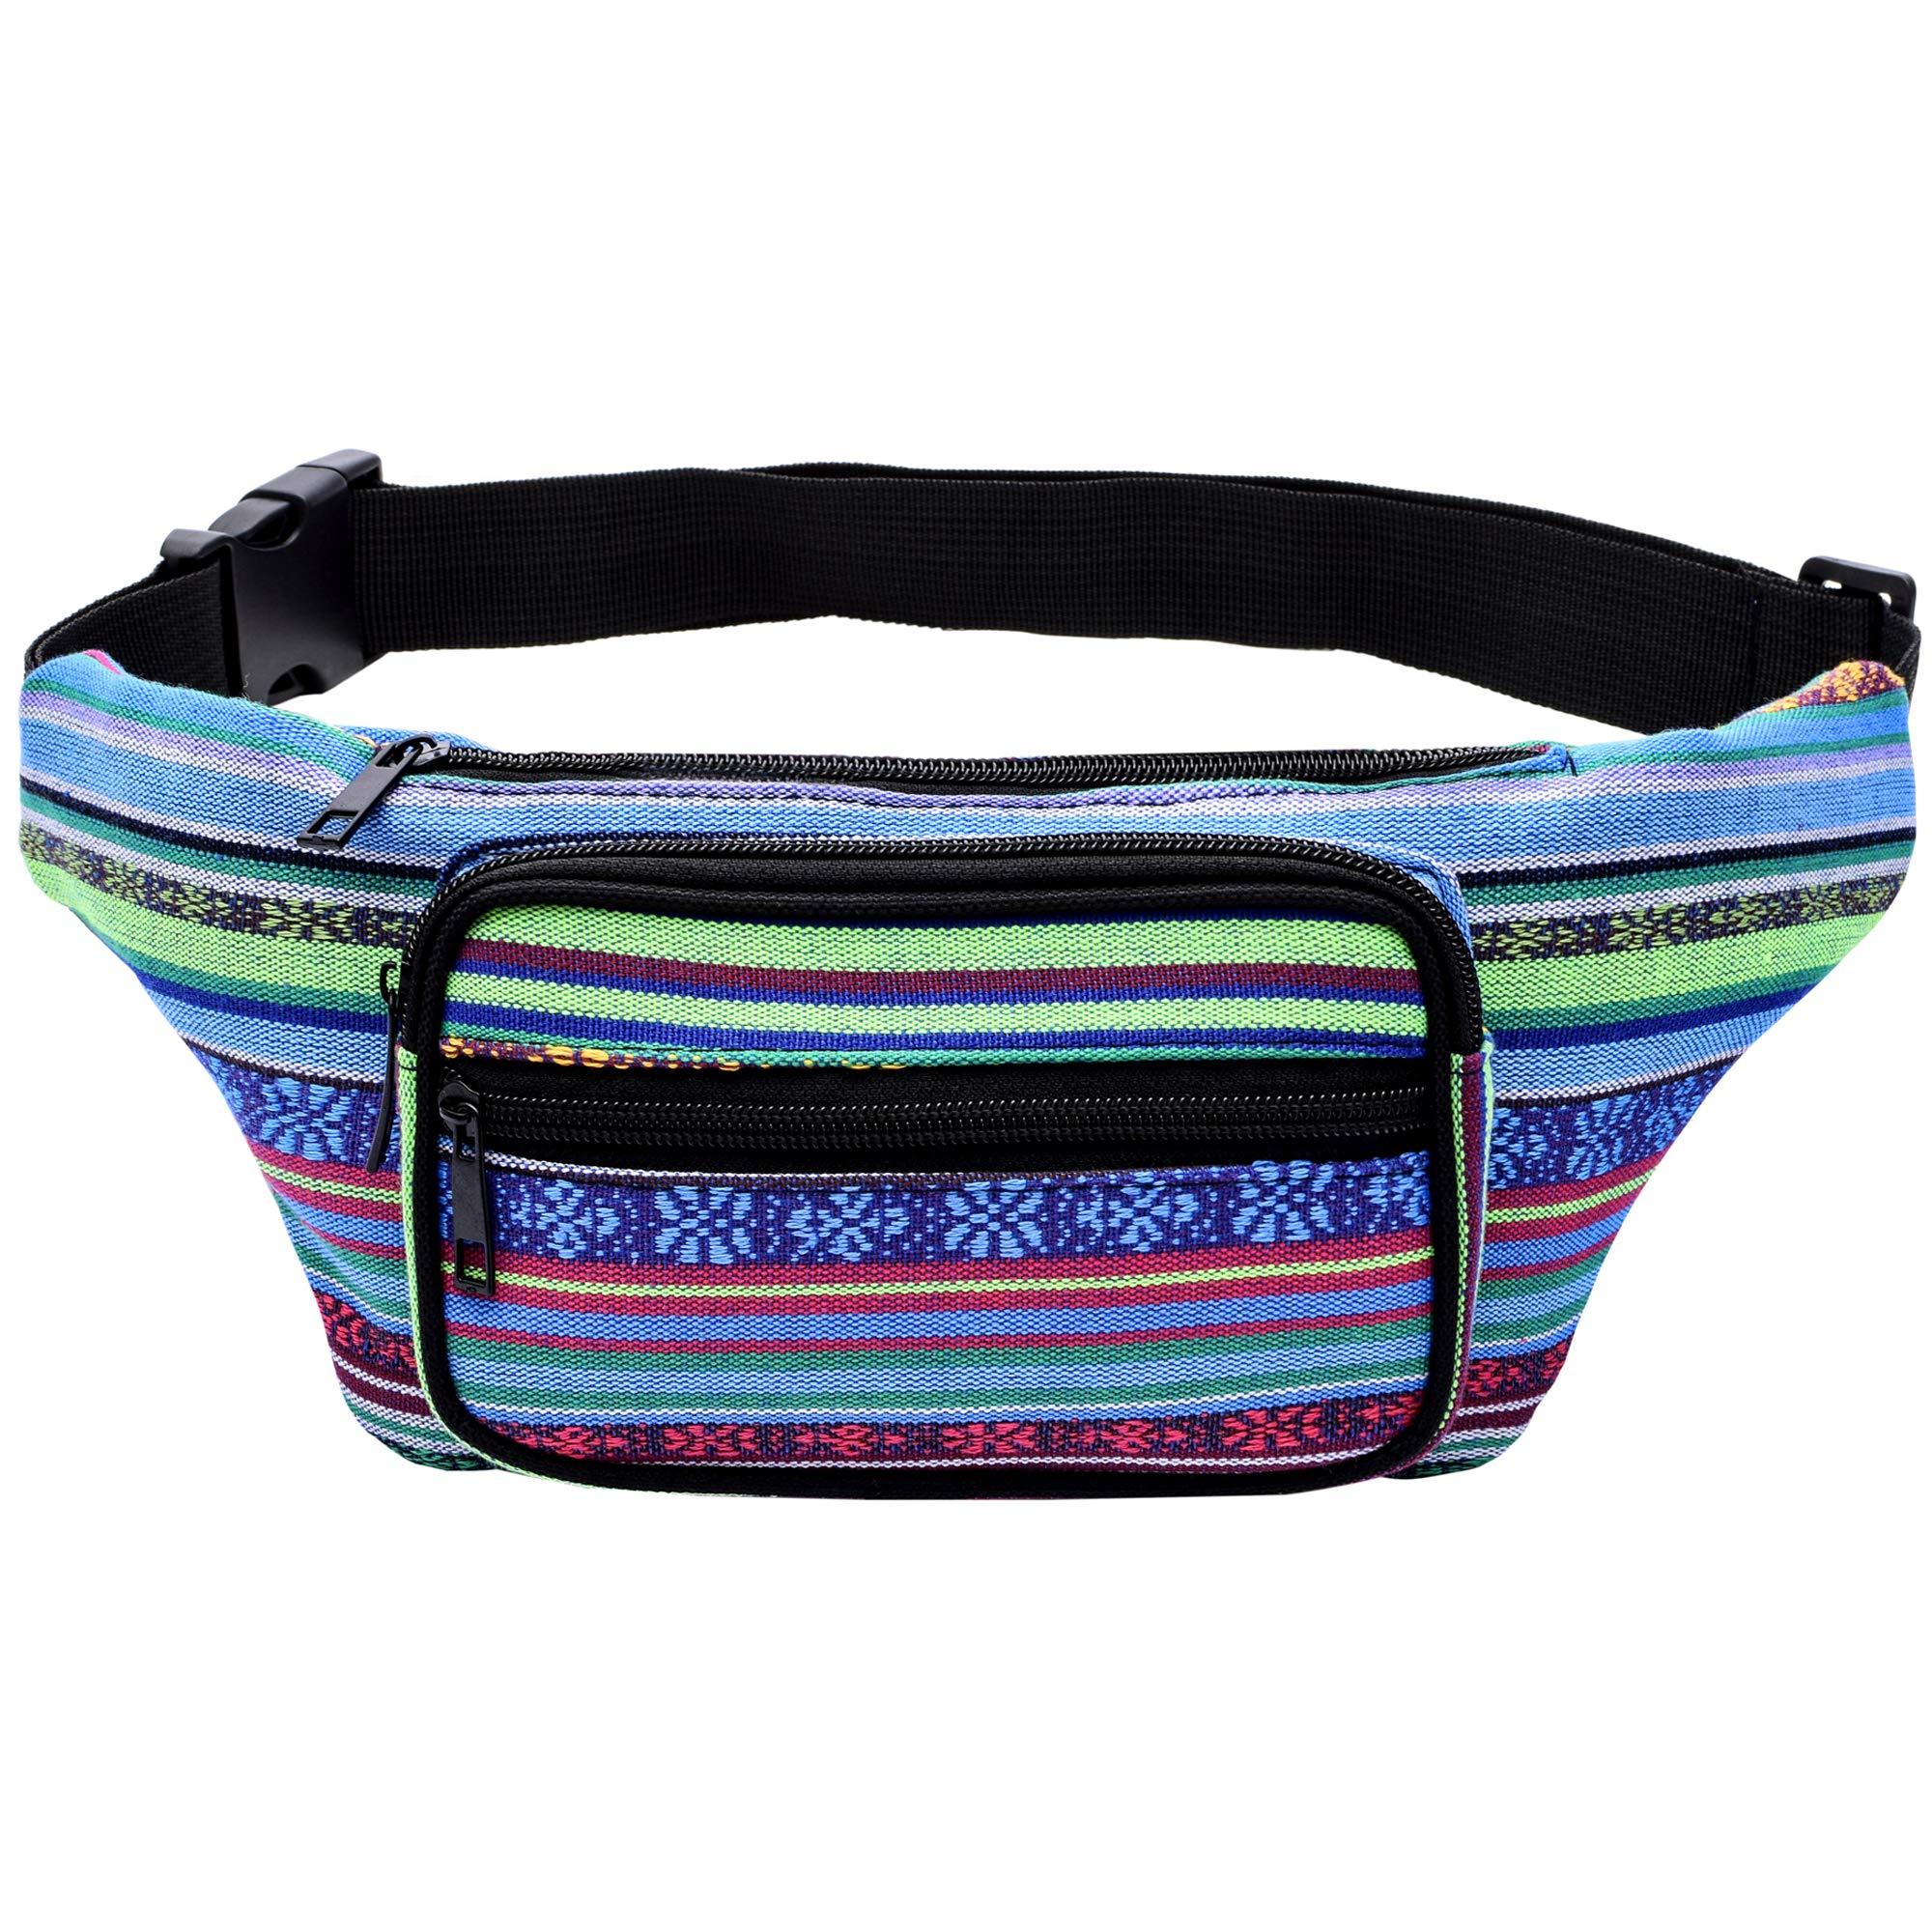 Kayhoma Boho Fanny Pack Stripe Festival Retro Vintage Flat Bum Bags Travel Hiking Hip Bum Waist Bag (Blue)